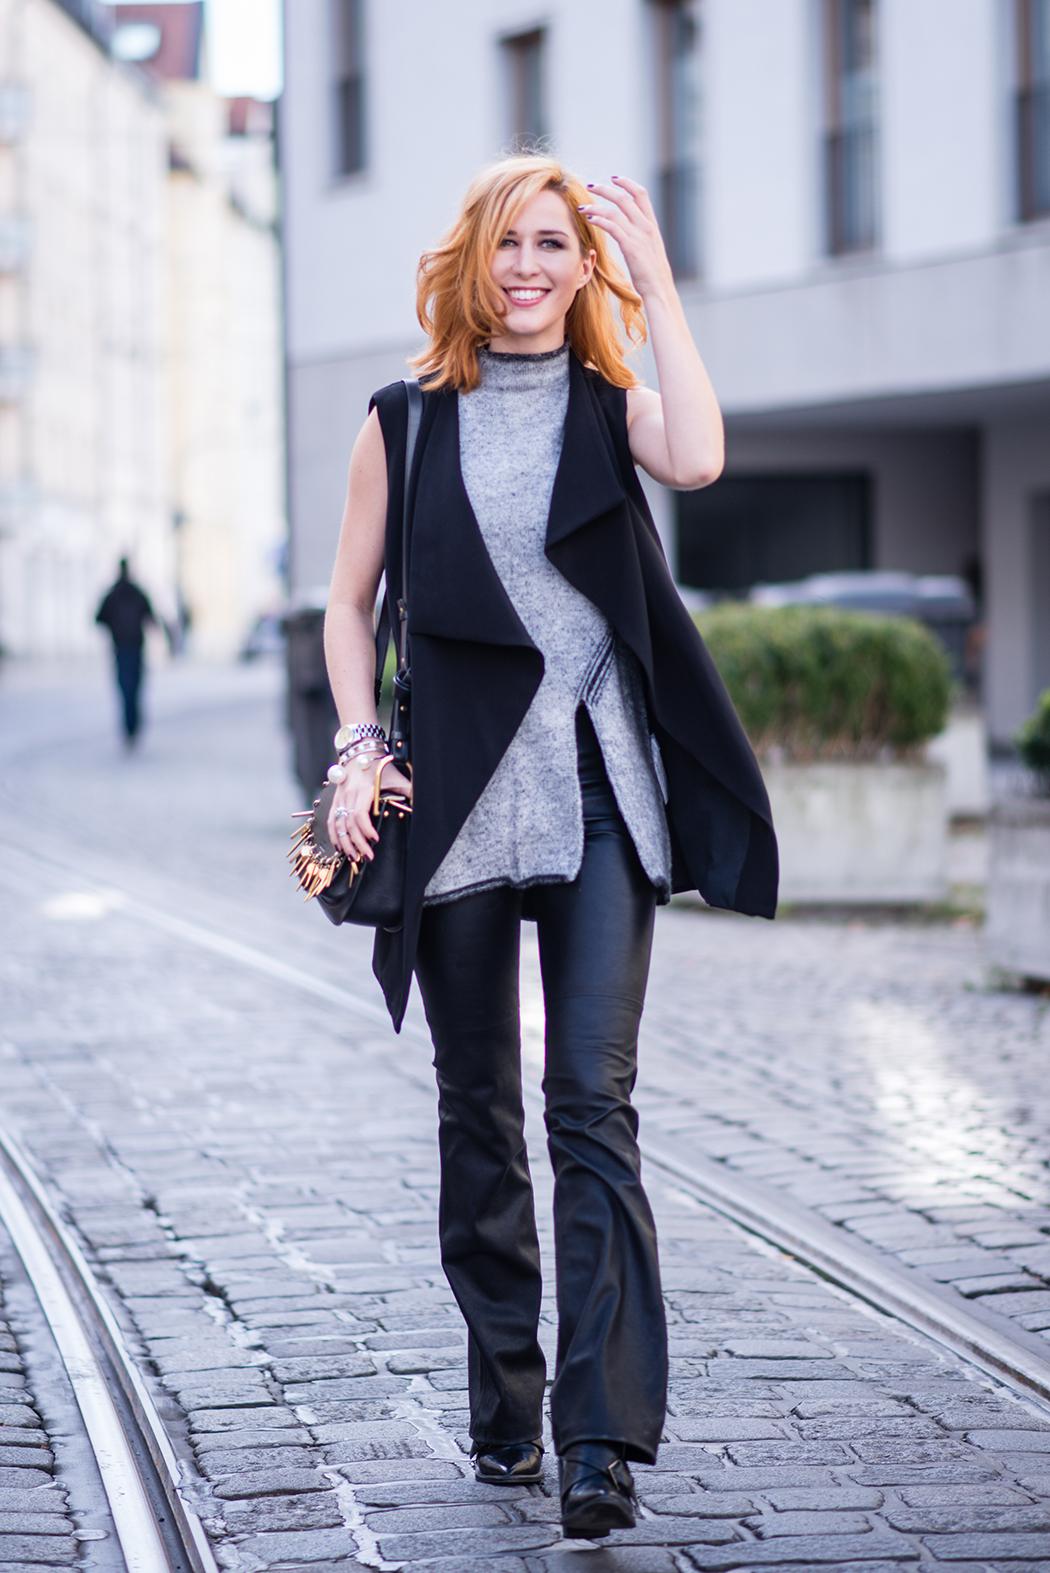 Fashionblog-Fashionblogger-Fashion-Blog-Blogger-München-Deutschland-Linda-Lindarella-erdbeerblond-Chloé-Hudson-Lederschlaghose-1-web